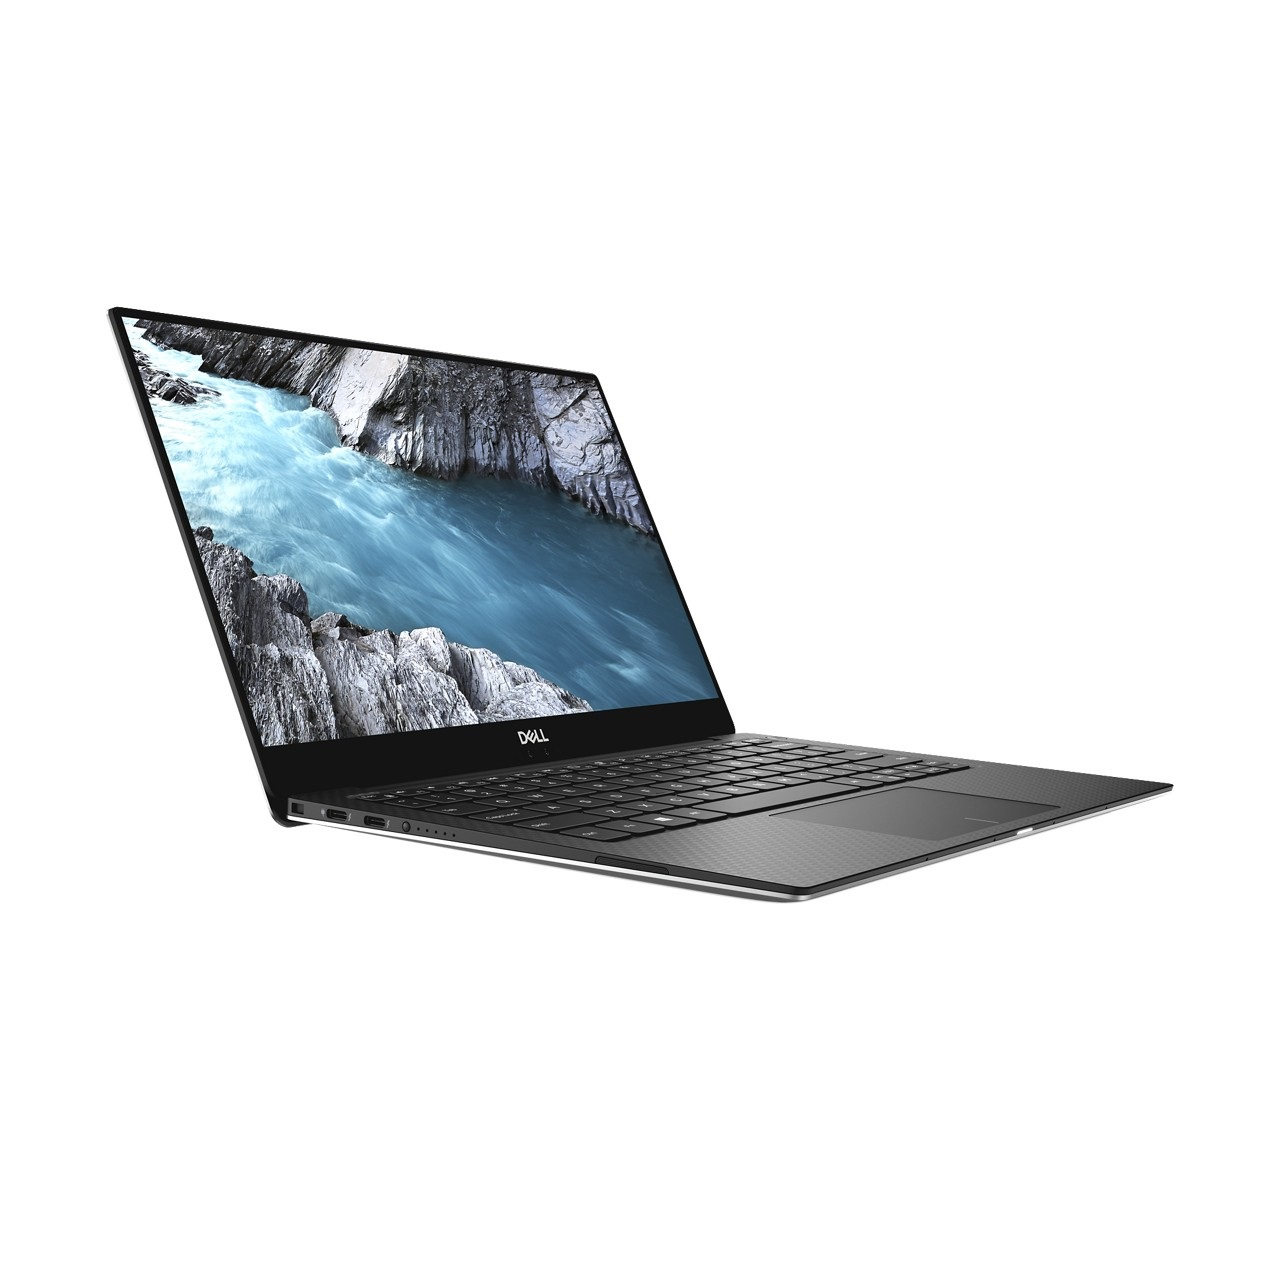 Dell XPS 13 9370 33,8cm (13,3